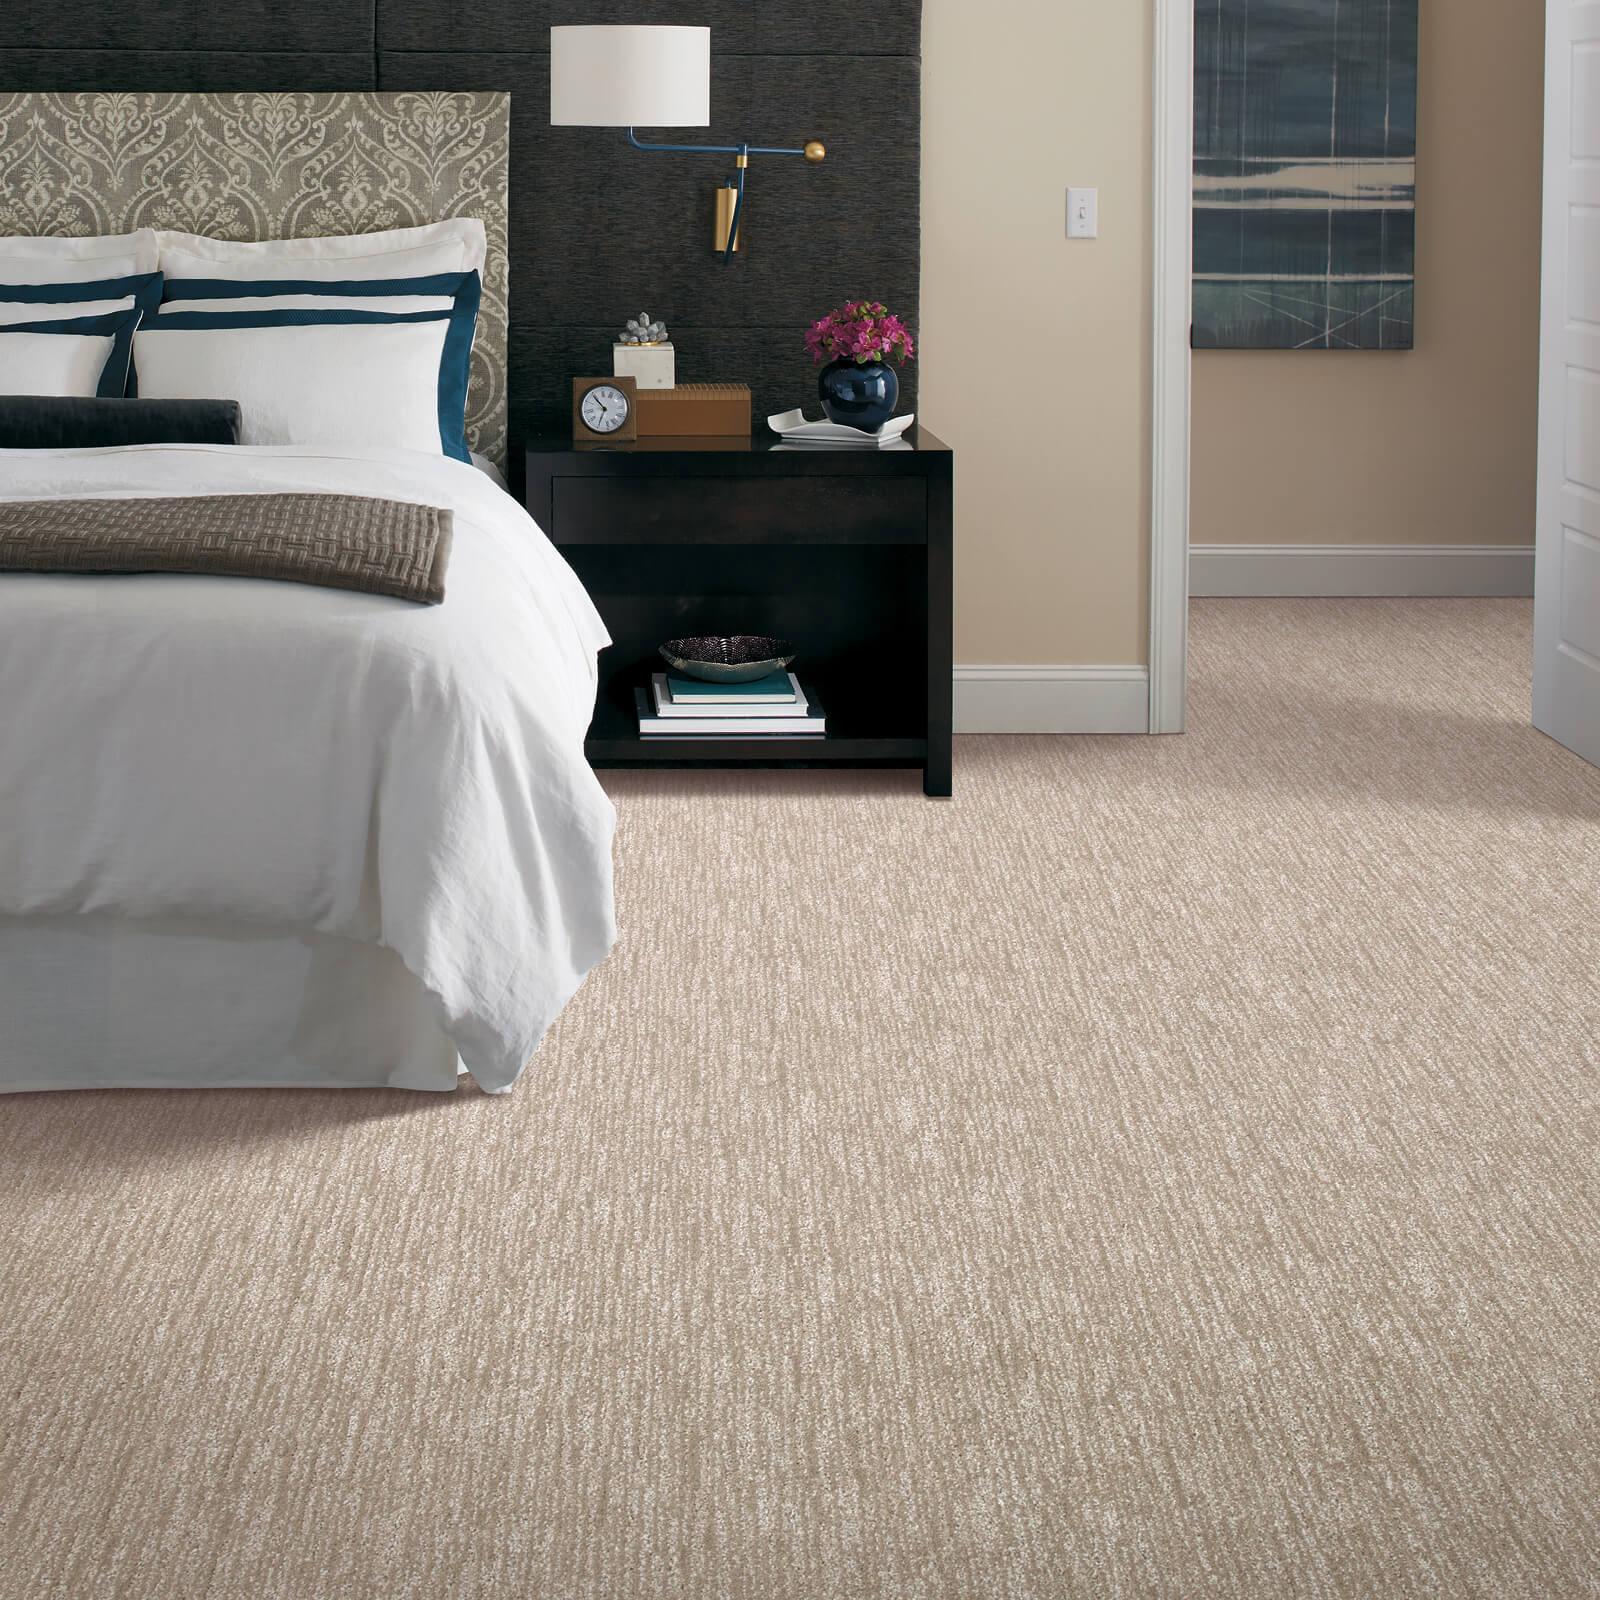 Bedroom flooring | McSwain Carpet & Floors